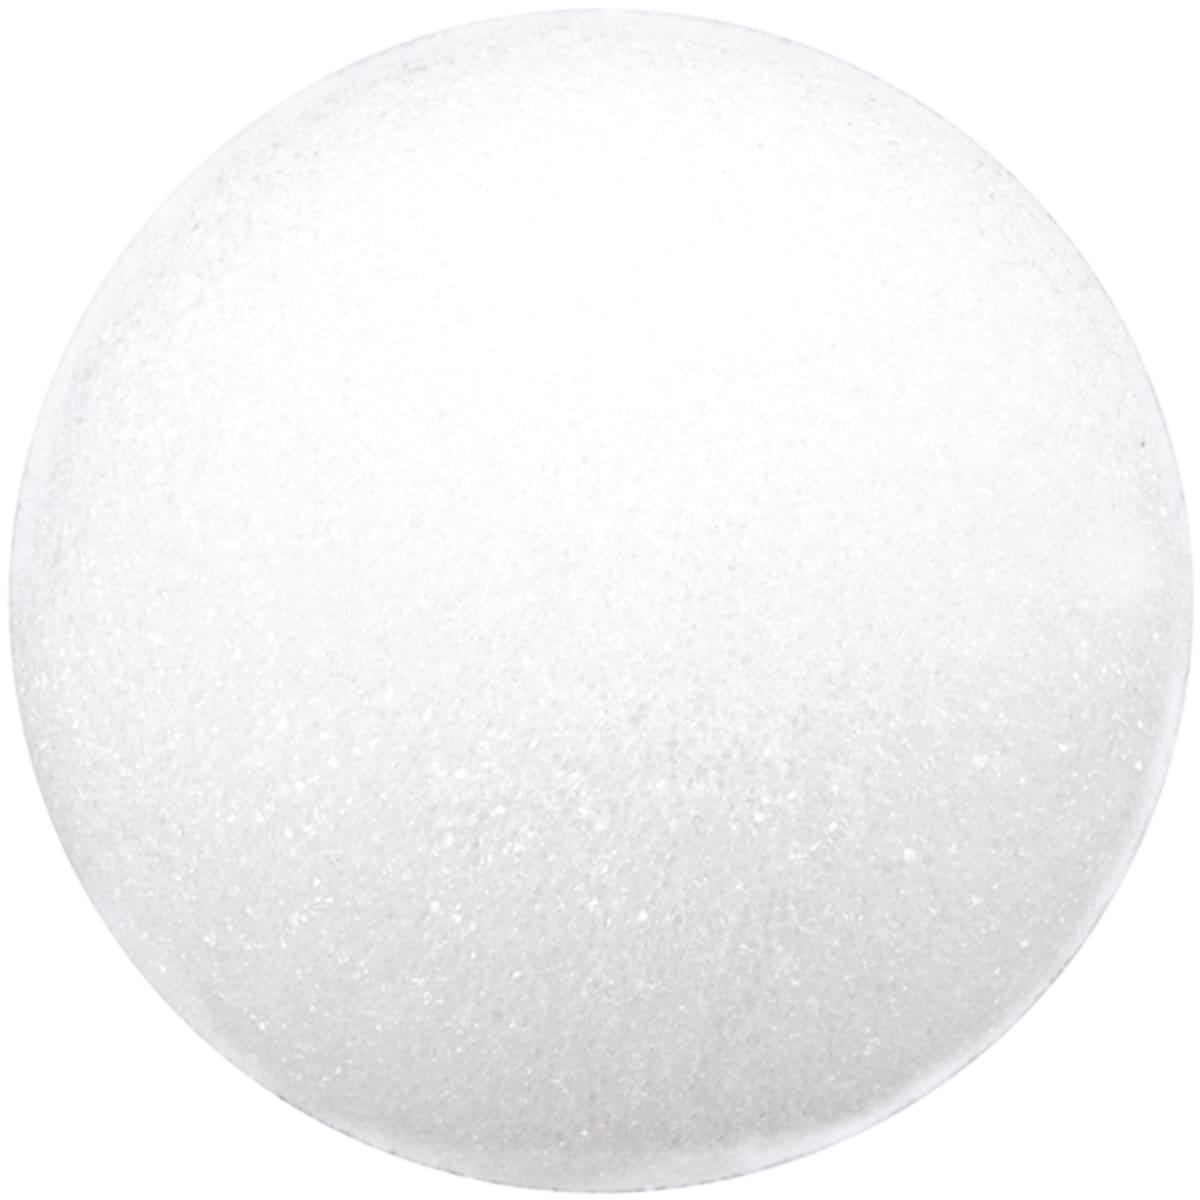 Floracraft Styrofoam Ball6in (6in), White